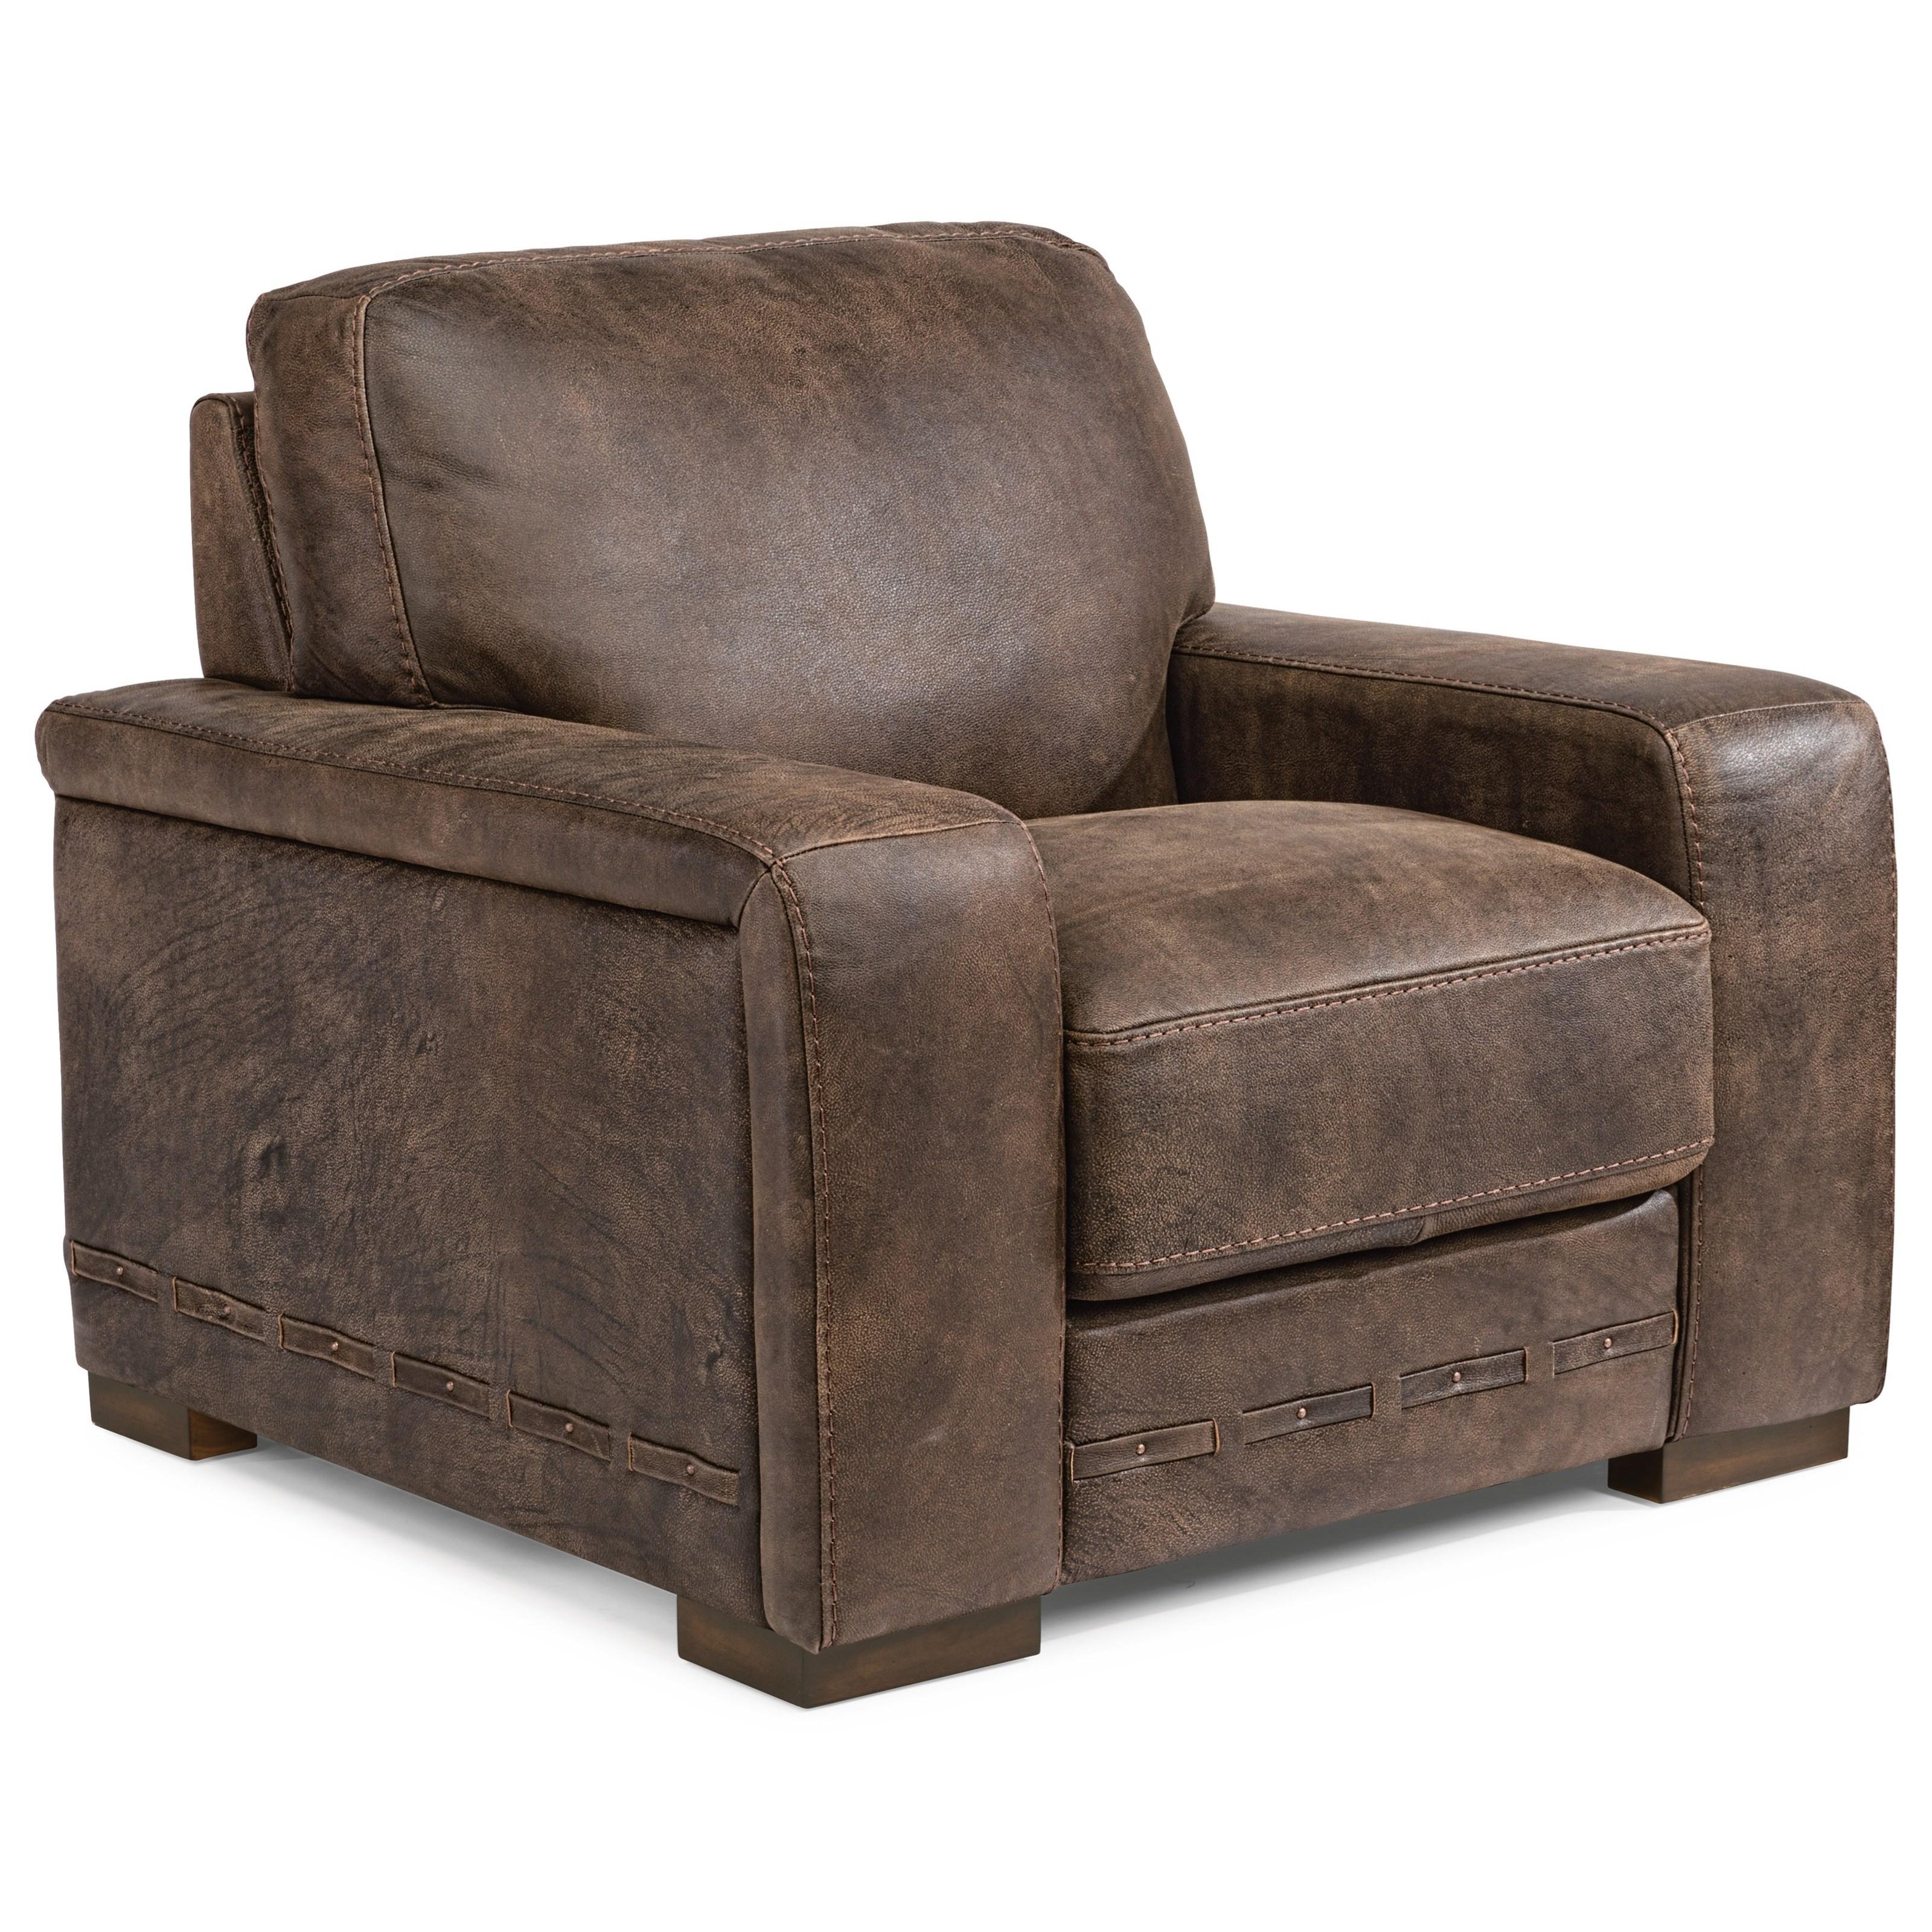 Flexsteel Furniture Telephone Number: Flexsteel Buxton Contemporary Leather Chair